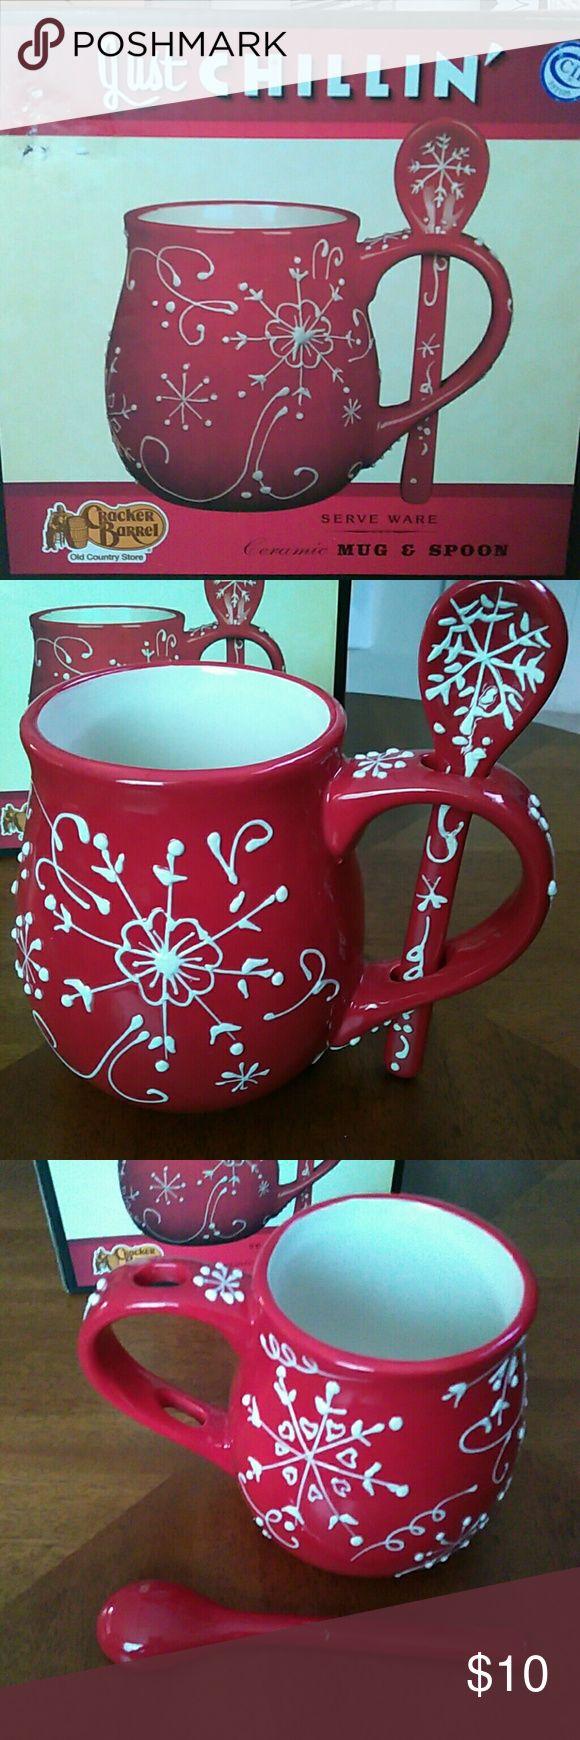 """Cracker Barrel"" Ceramic Mug&Spoon (NWB) 24 fl oz. Mug and a spoon . Ceramic red with white  snowflake design. NWB Cracker Barrel Other"